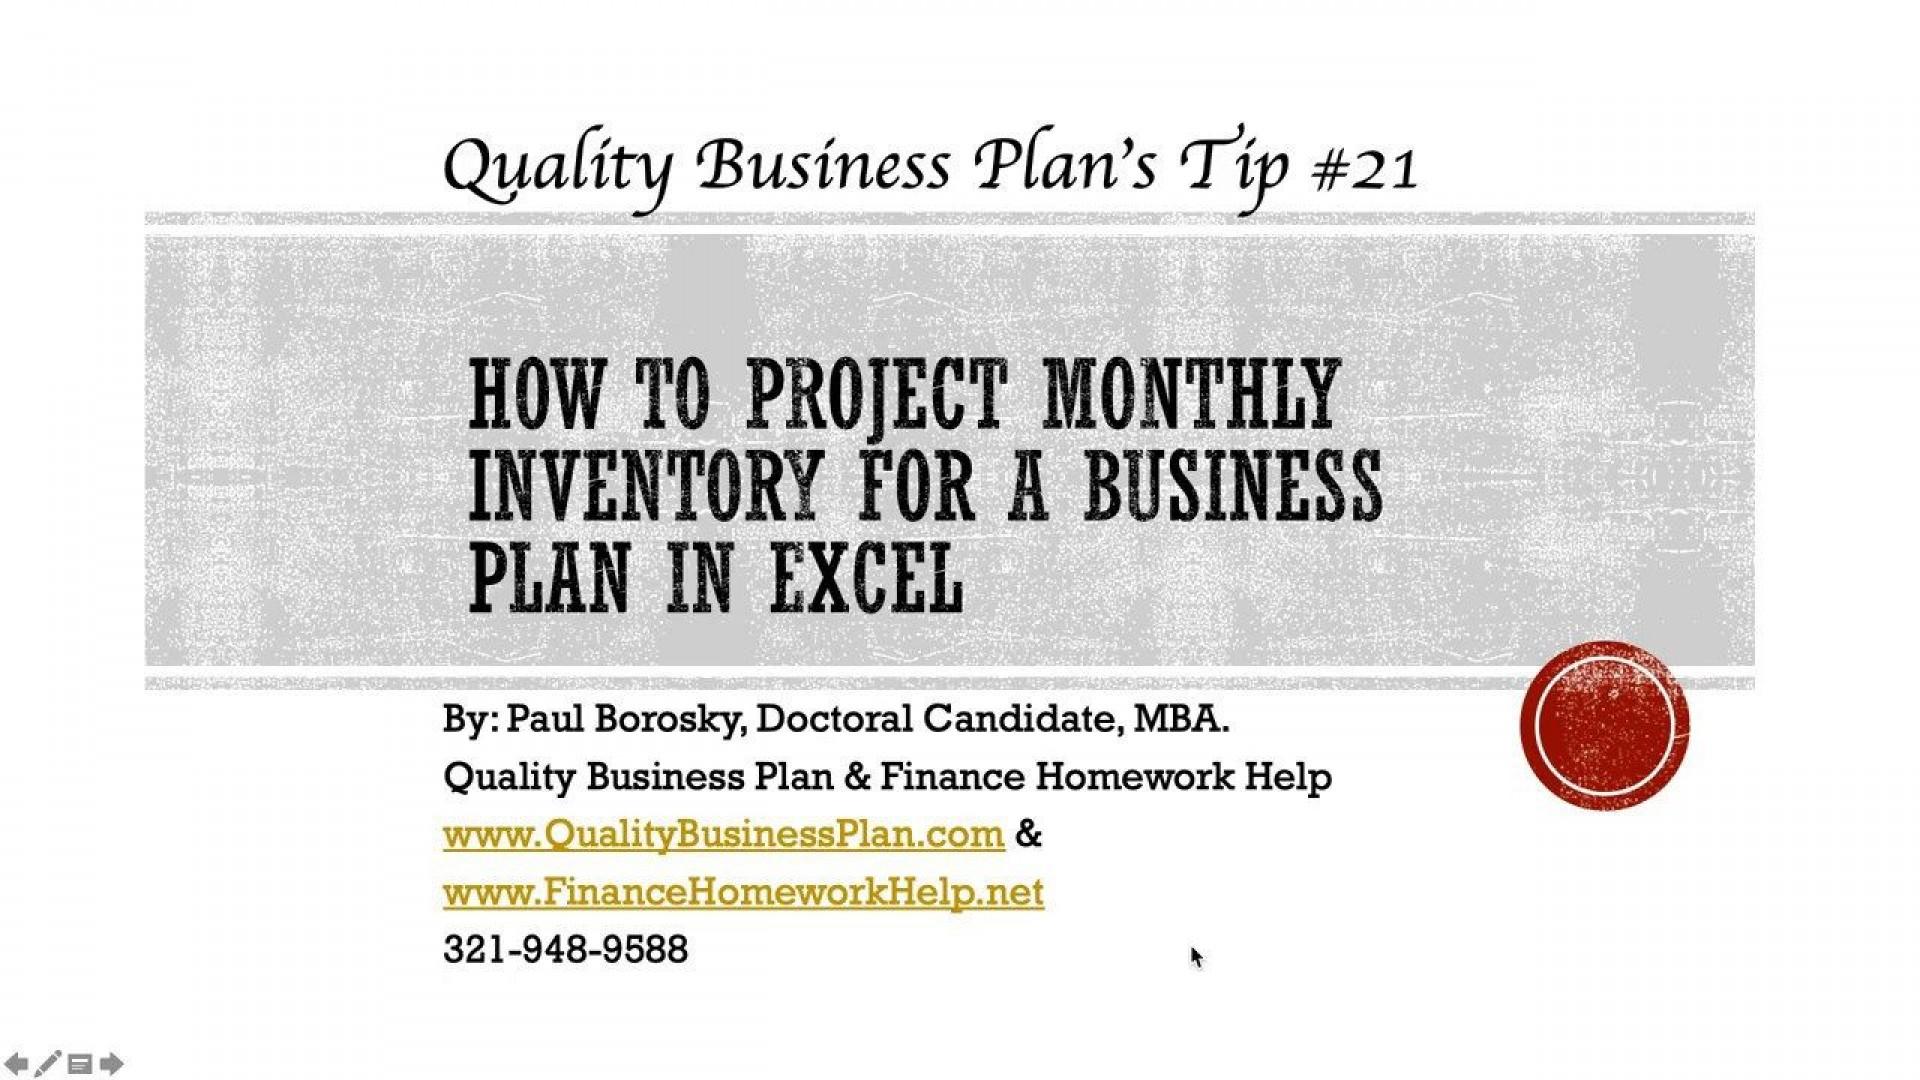 003 Dreaded Score Deluxe Startup Busines Plan Template Photo  Score-deluxe-startup-business-plan-template 1.docx1920